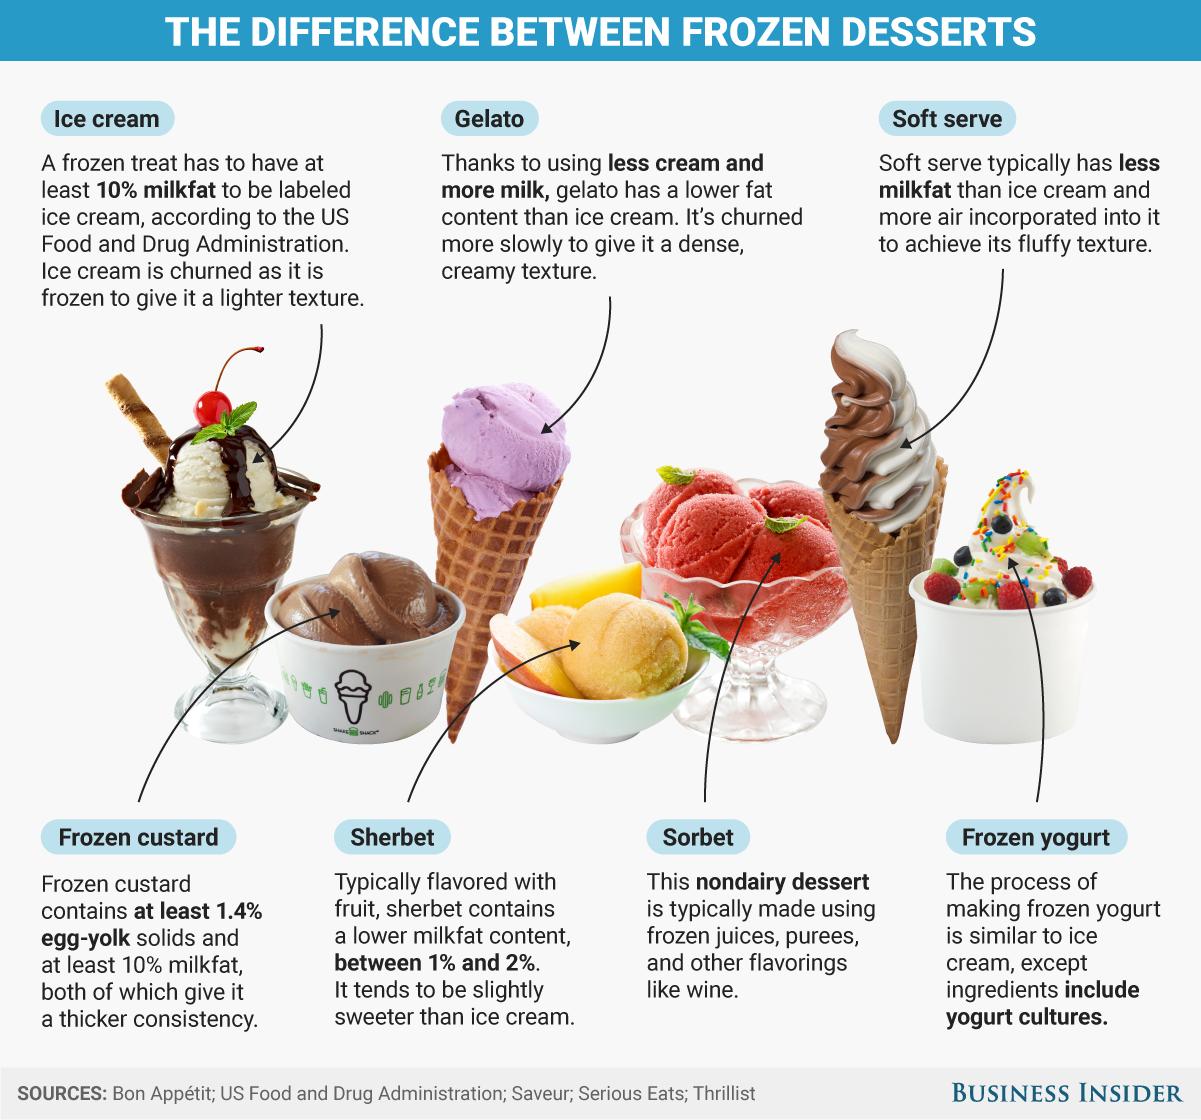 Bi Graphics The Difference Between Ice Cream And Other Frozen Desserts Frozen Custard Frozen Desserts Ice Cream Business